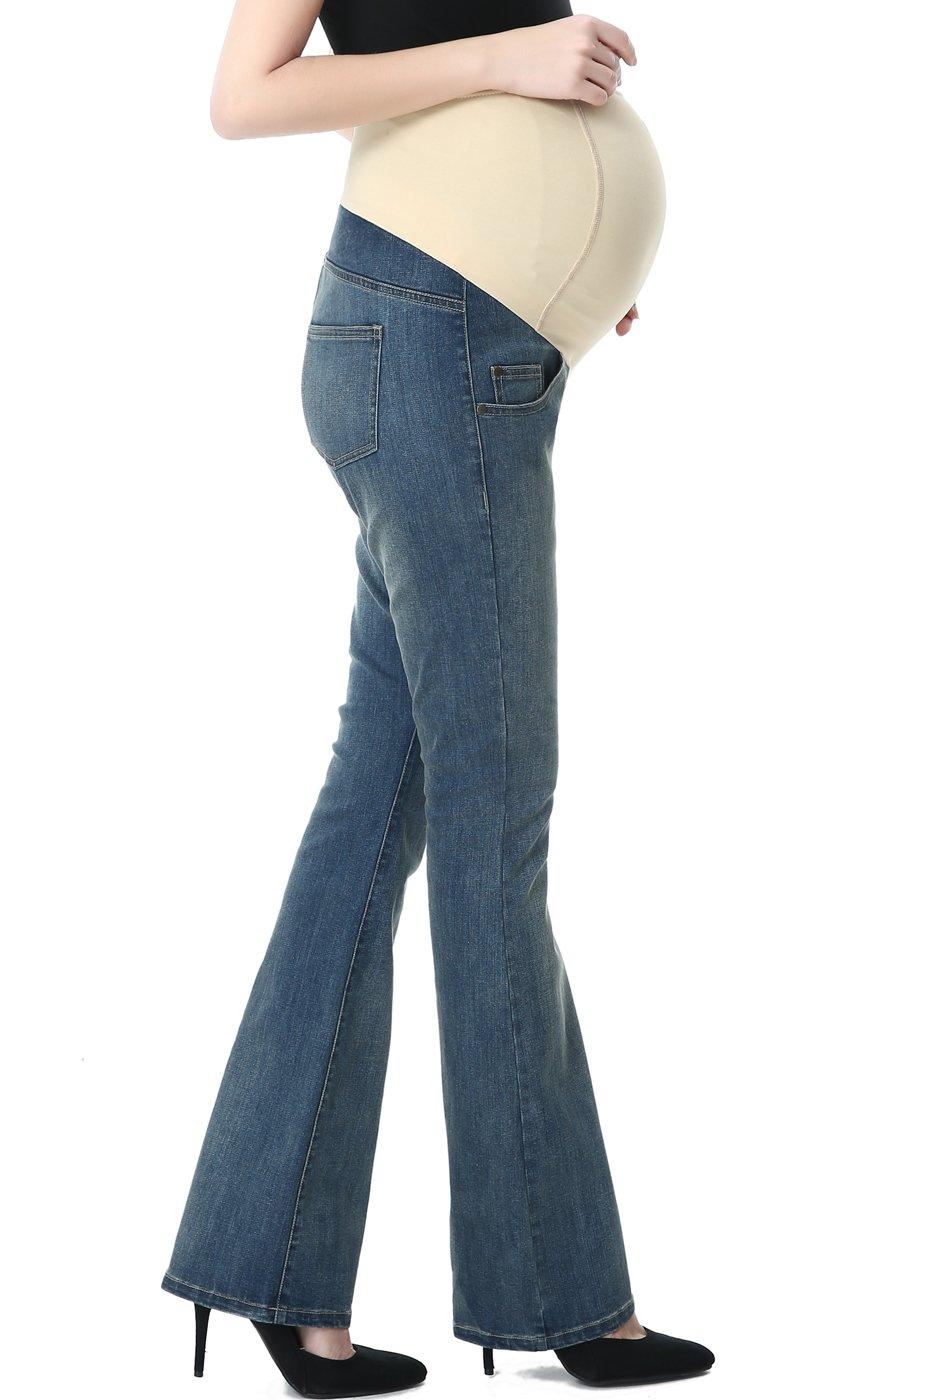 Momo Maternity Women's Modern Boot Cut Denim Jeans - Medium Indigo 29